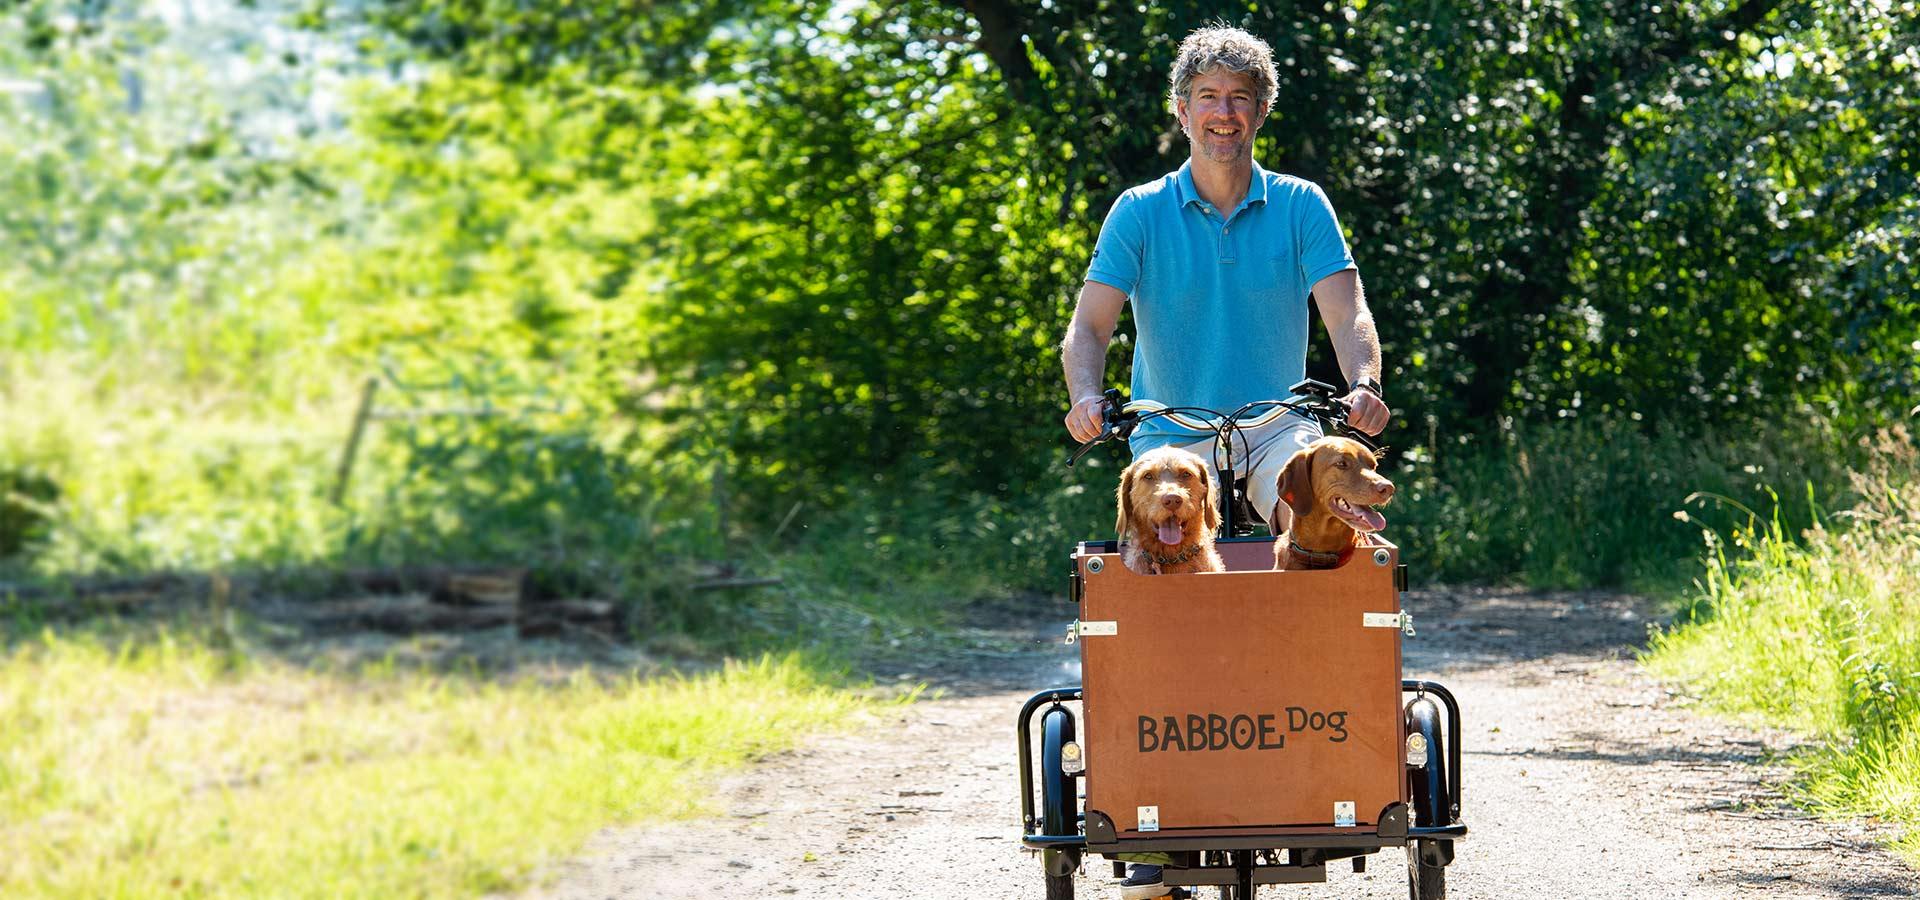 Babboe Dog Hunde-Lastenrad